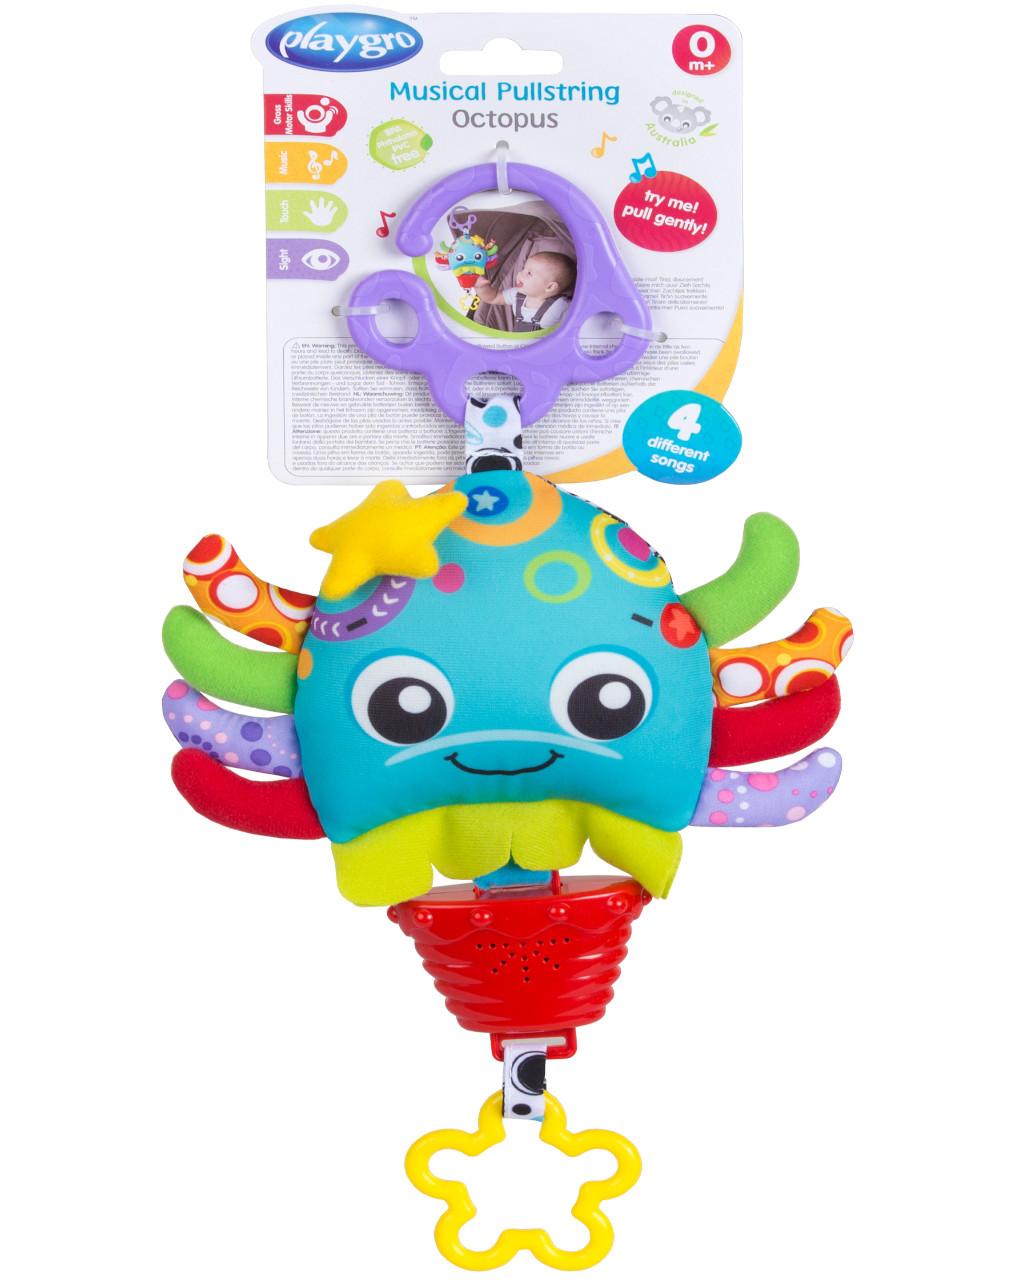 Playgro - musical pullstring octopus - Playgro